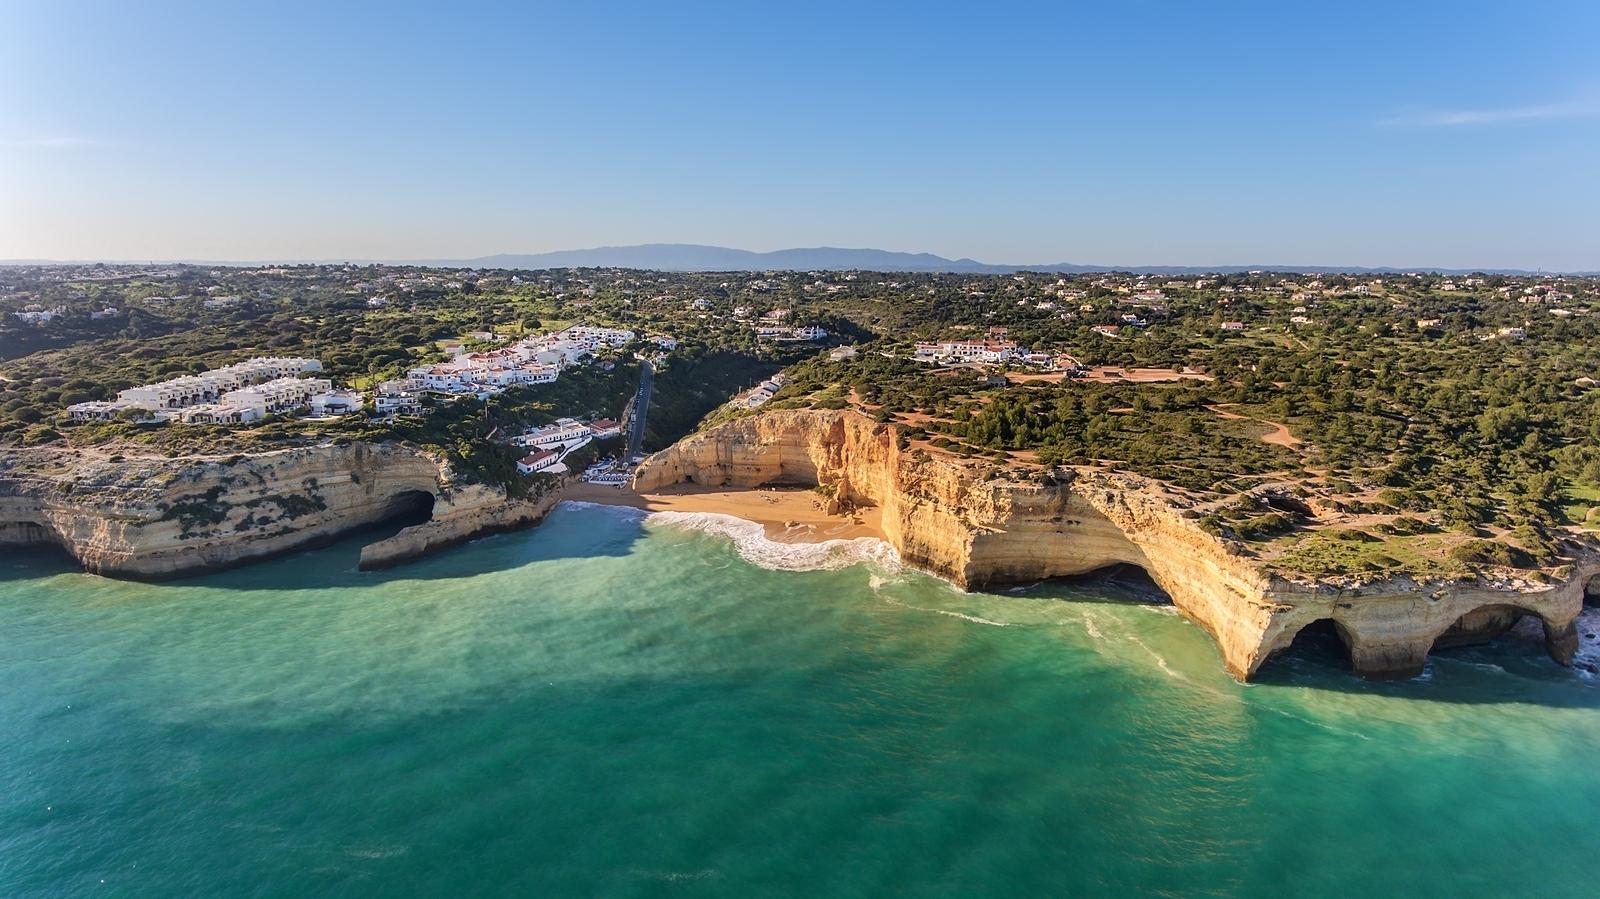 Benagil beach and fishing port is filmed from the sky. Algarve Portugal